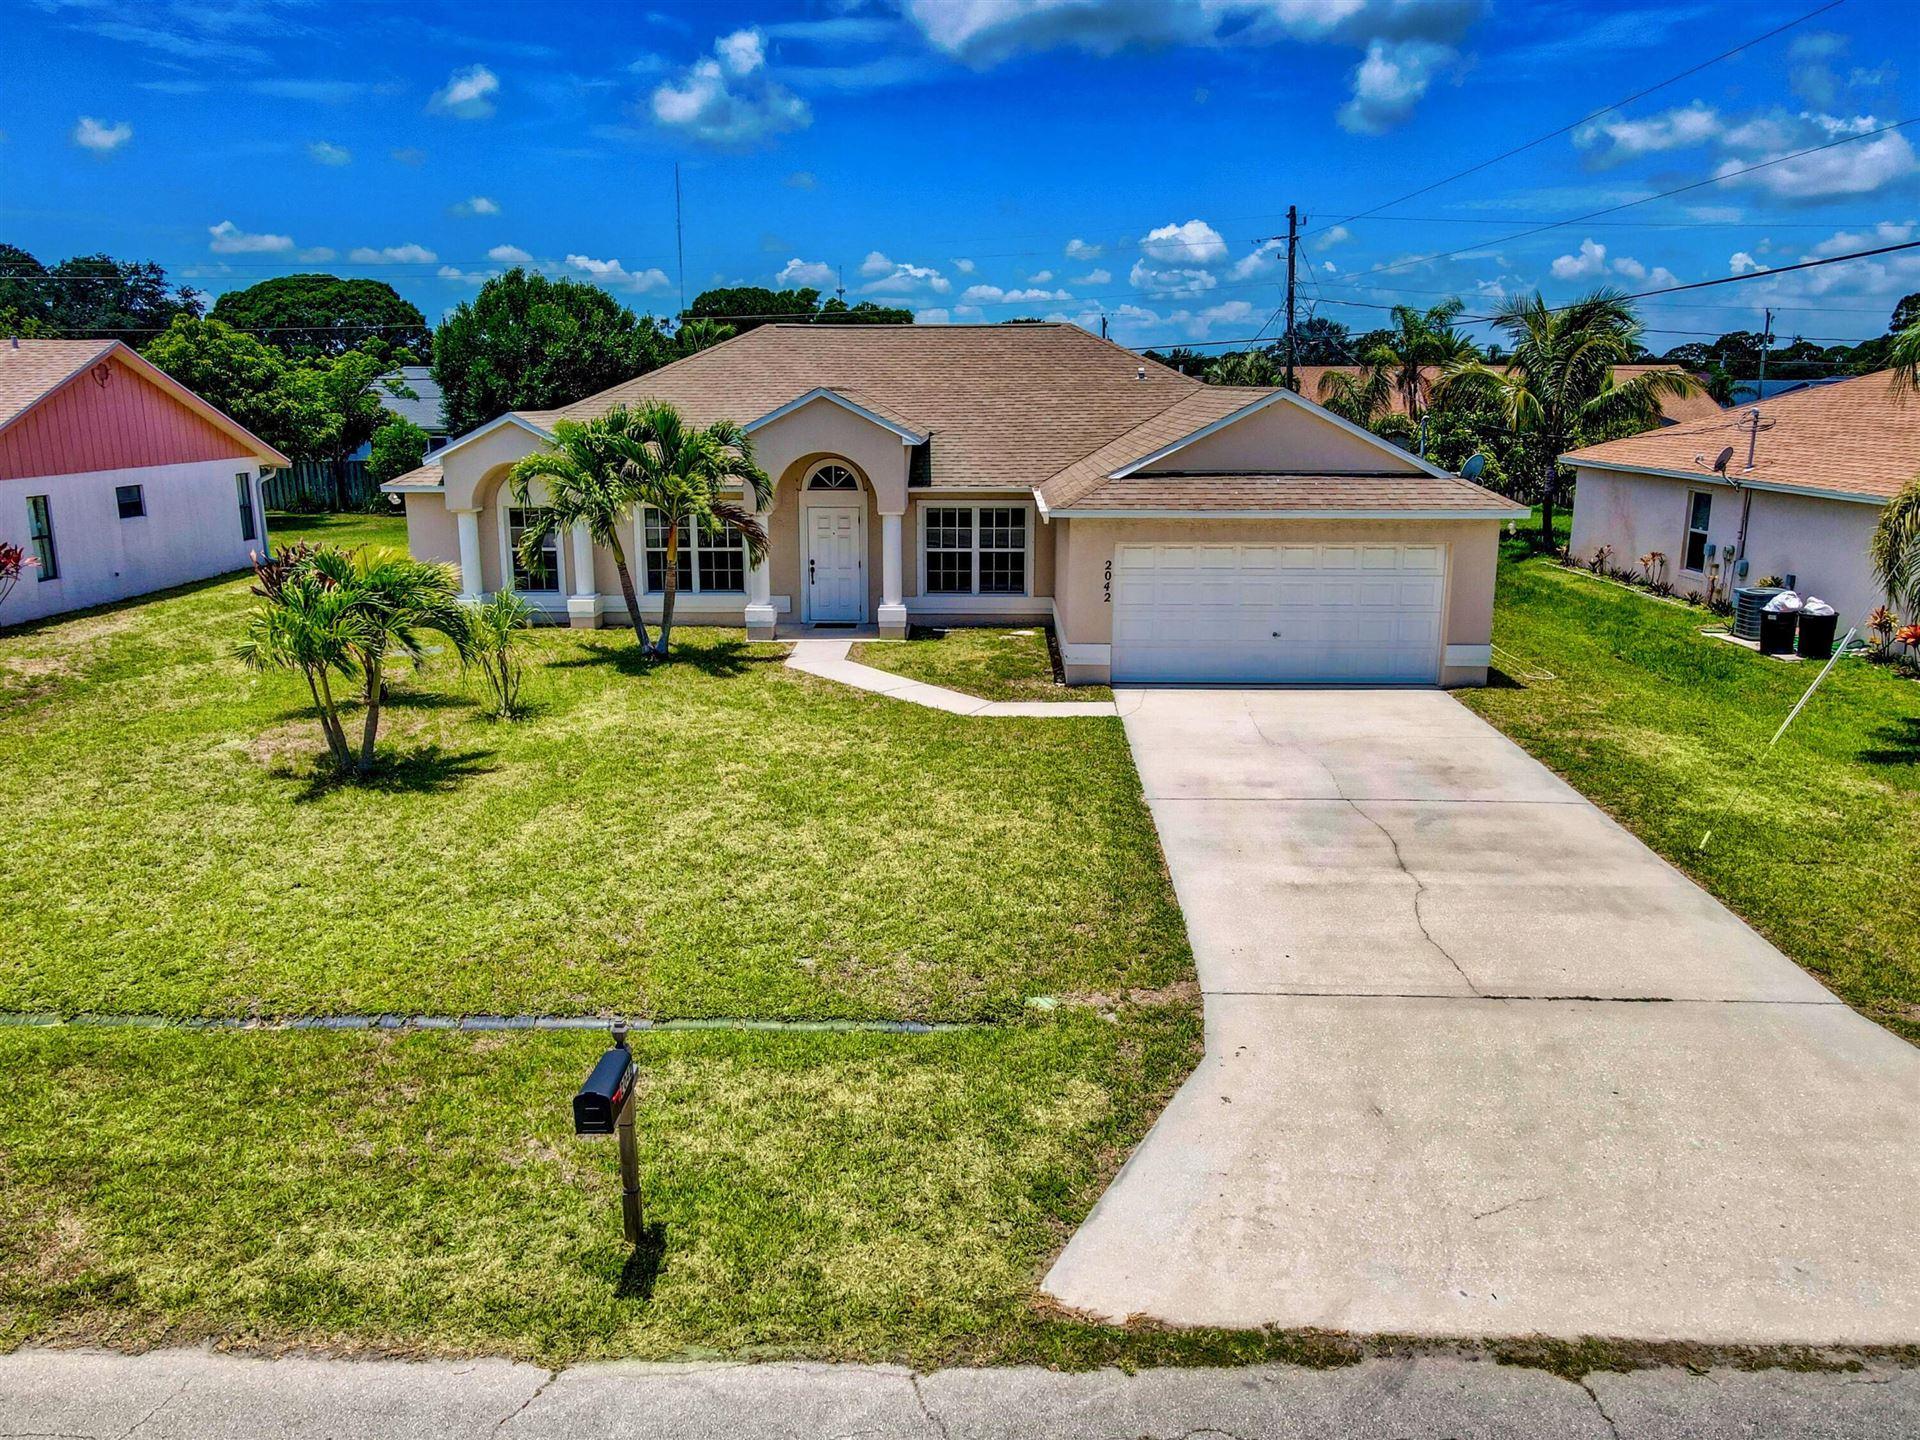 2042 SE Camilo Street, Port Saint Lucie, FL 34952 - MLS#: RX-10723394